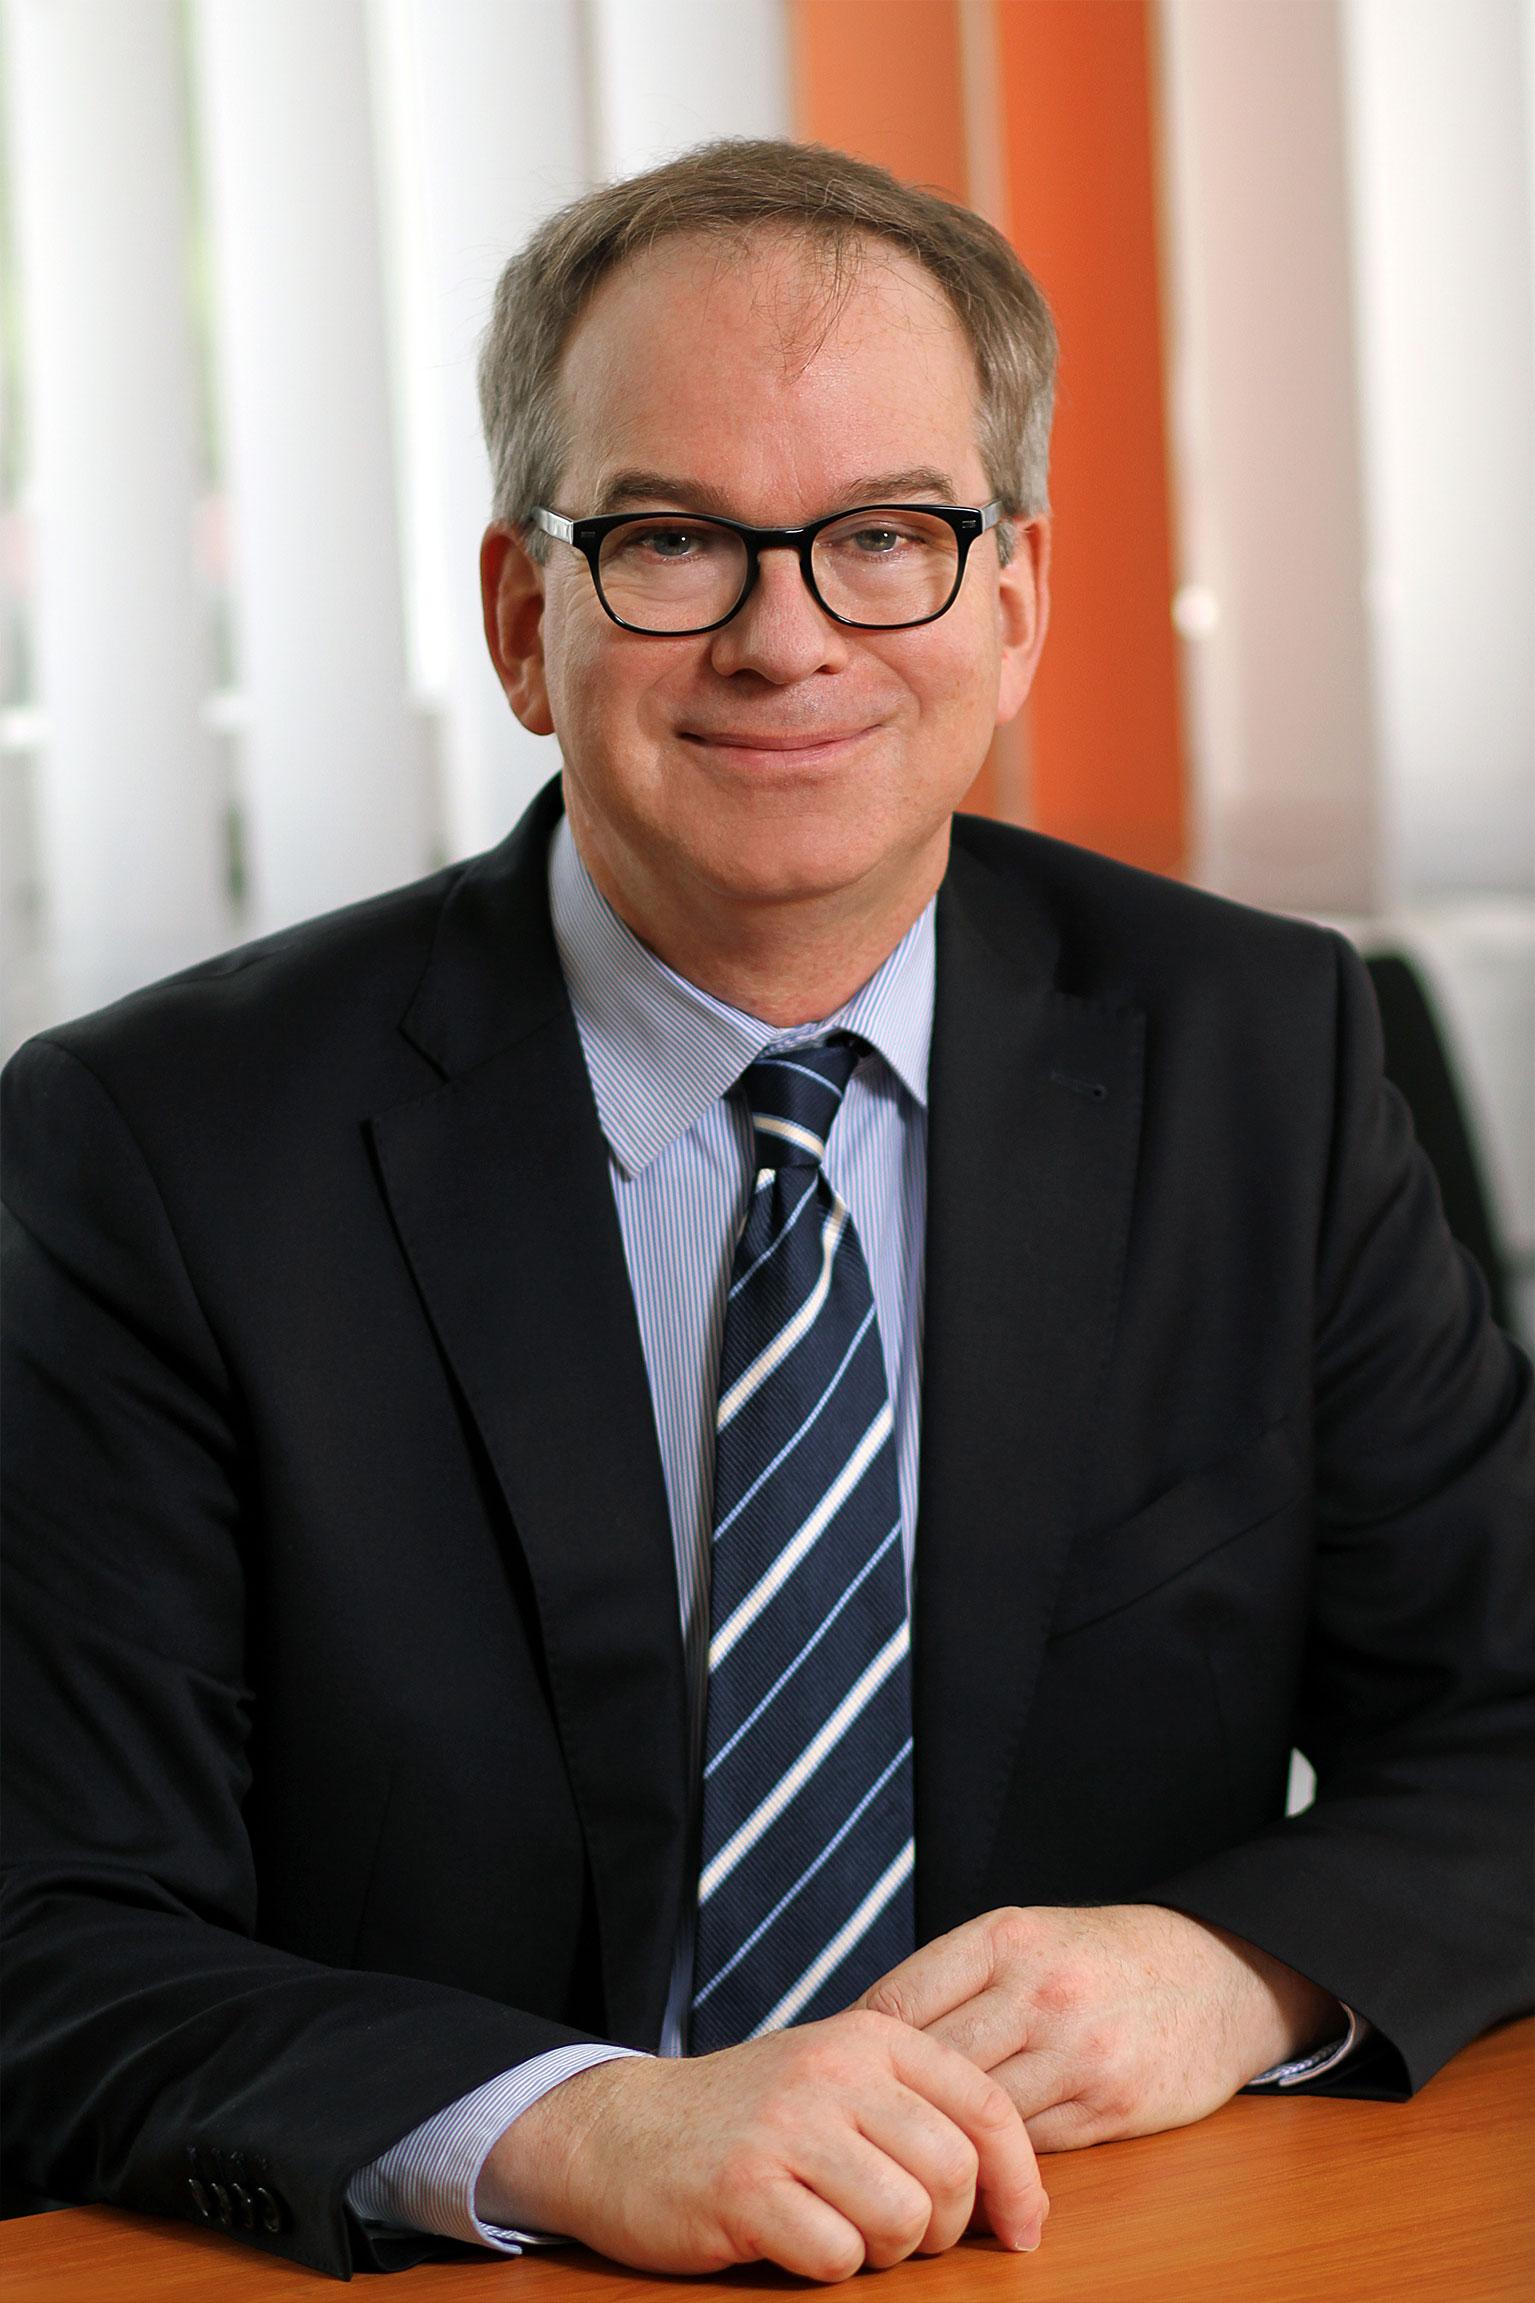 Prof. Dr. Hans D. Schotten